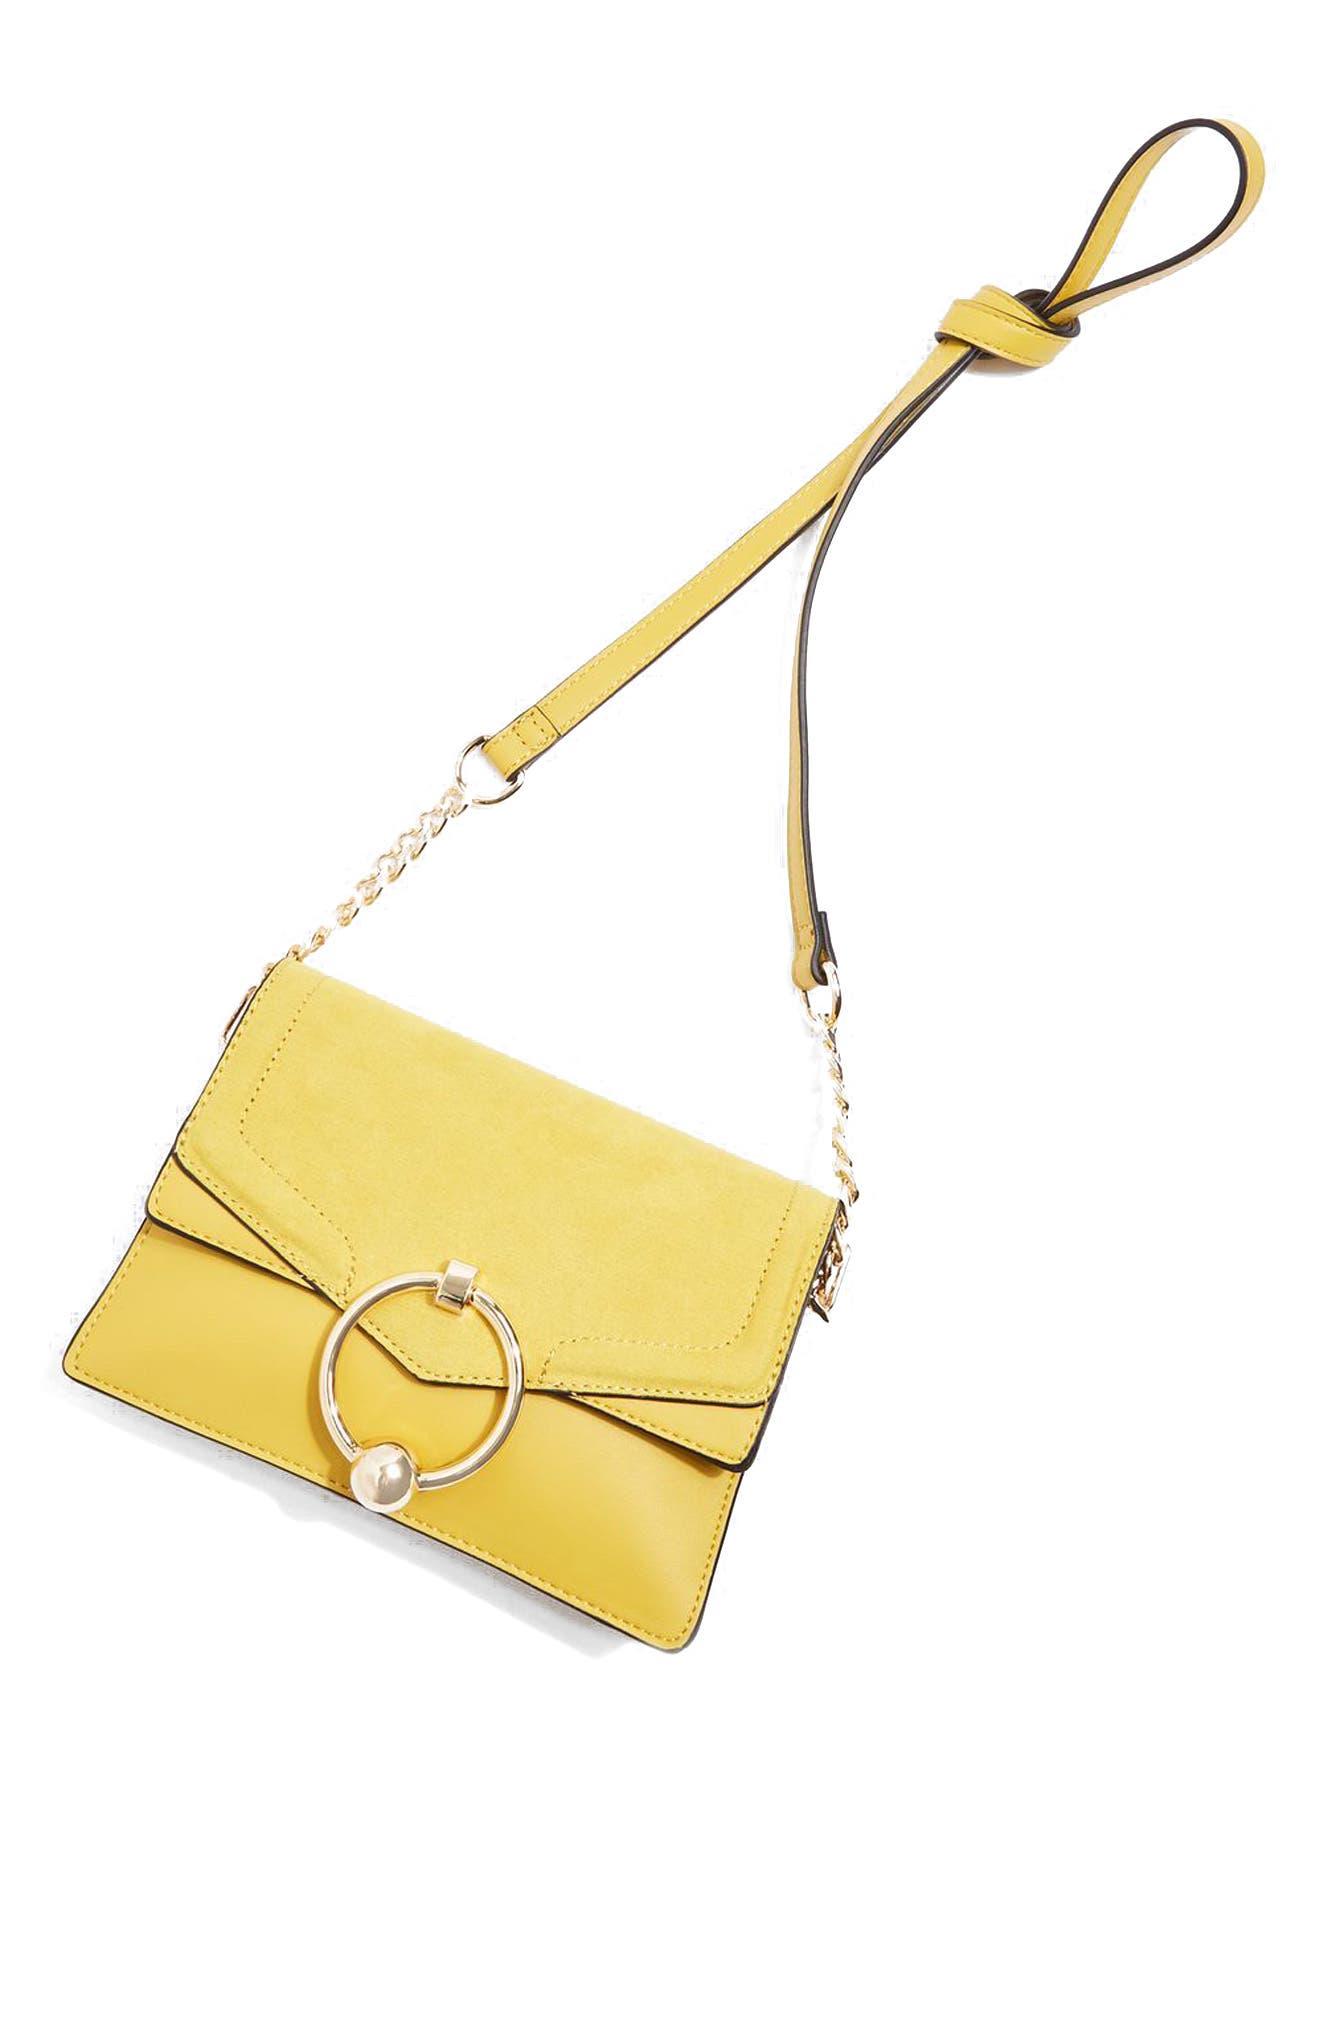 Seline Faux Leather Crossbody Bag,                             Alternate thumbnail 8, color,                             Yellow Multi